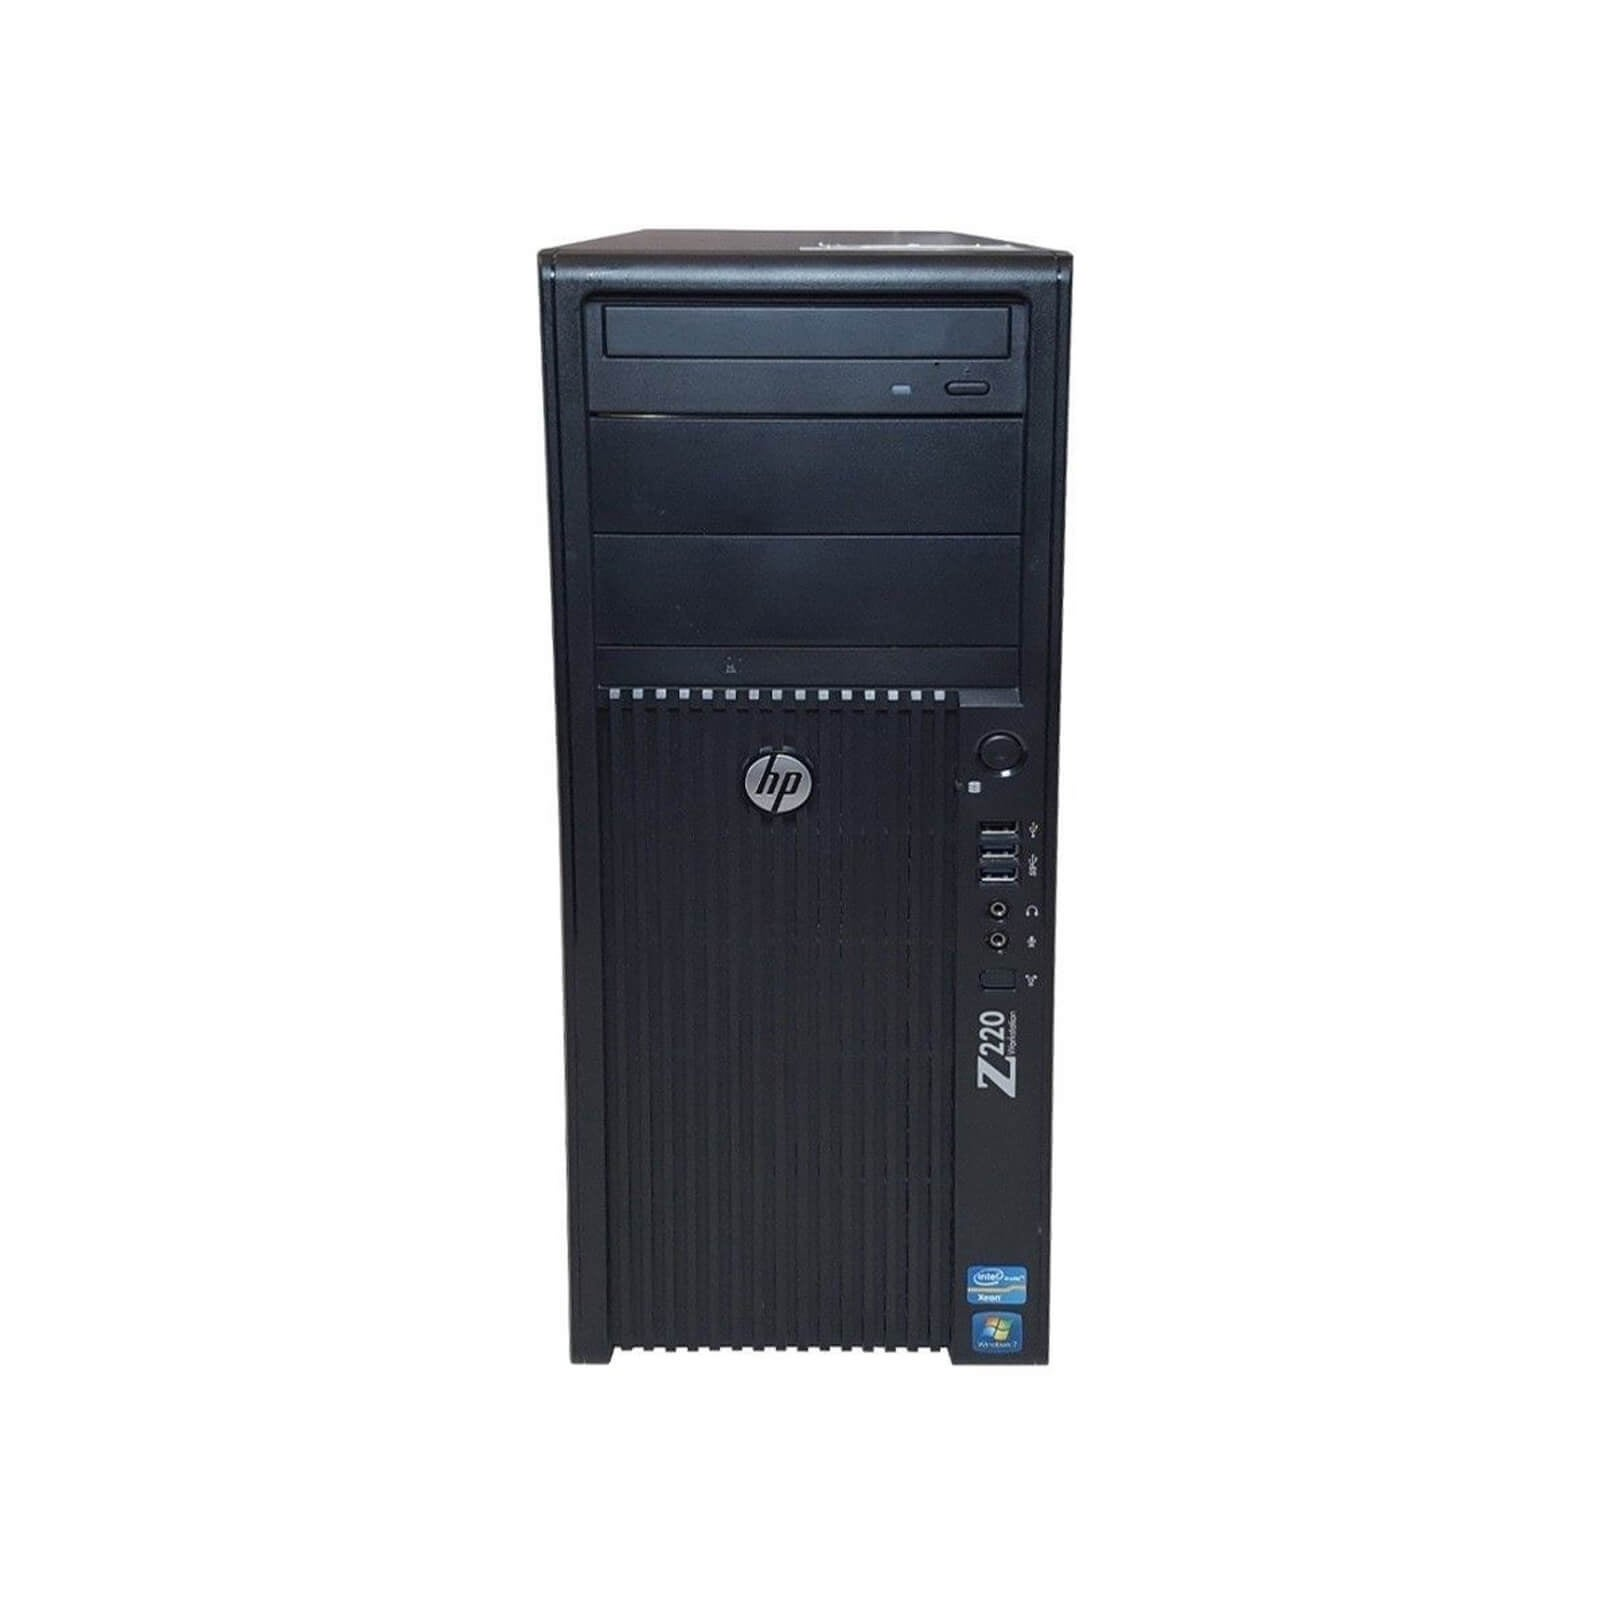 Hp Z220 Workstation Drivers Windows 7 64 Bit Download